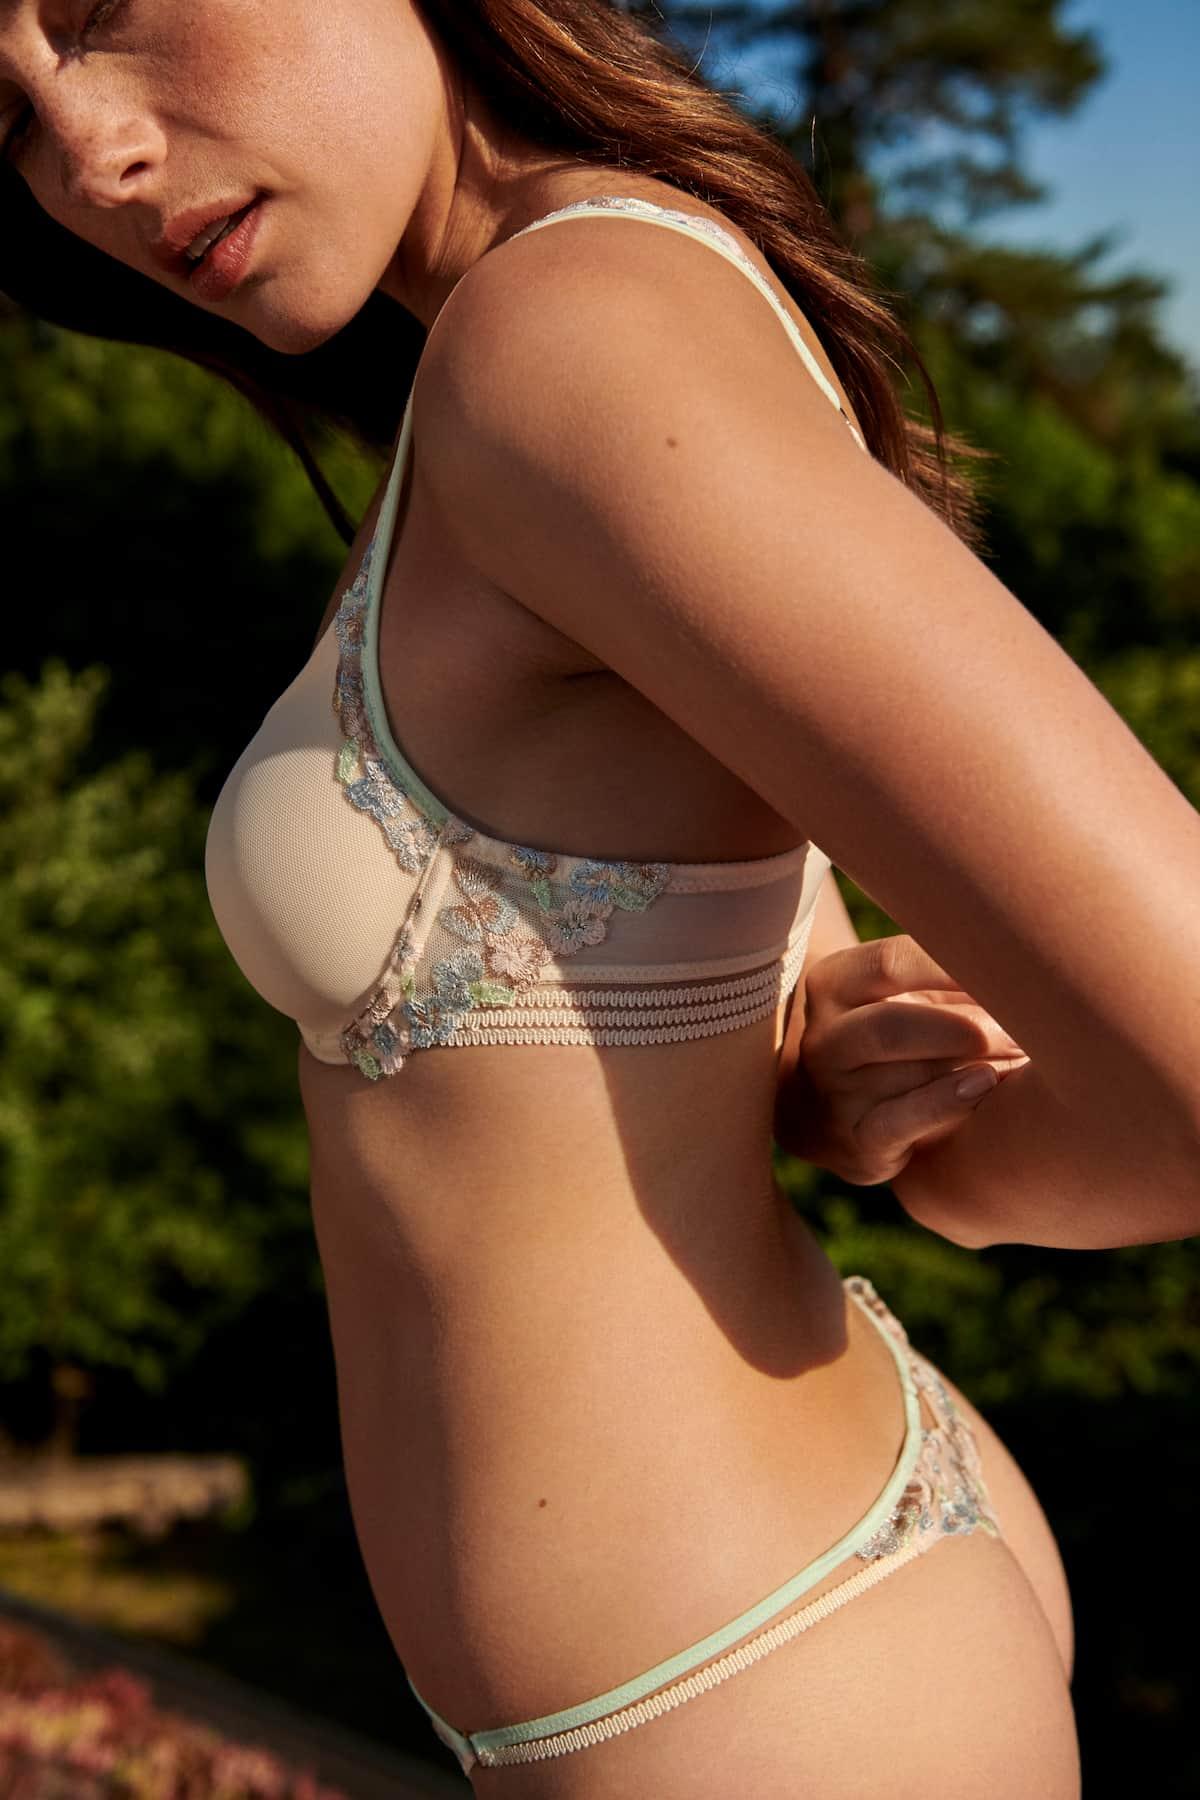 BH und Slip Marie Jo Modell Nathy, Farbe Pearled Ivory - Mode Frühjahr-Sommer 2021